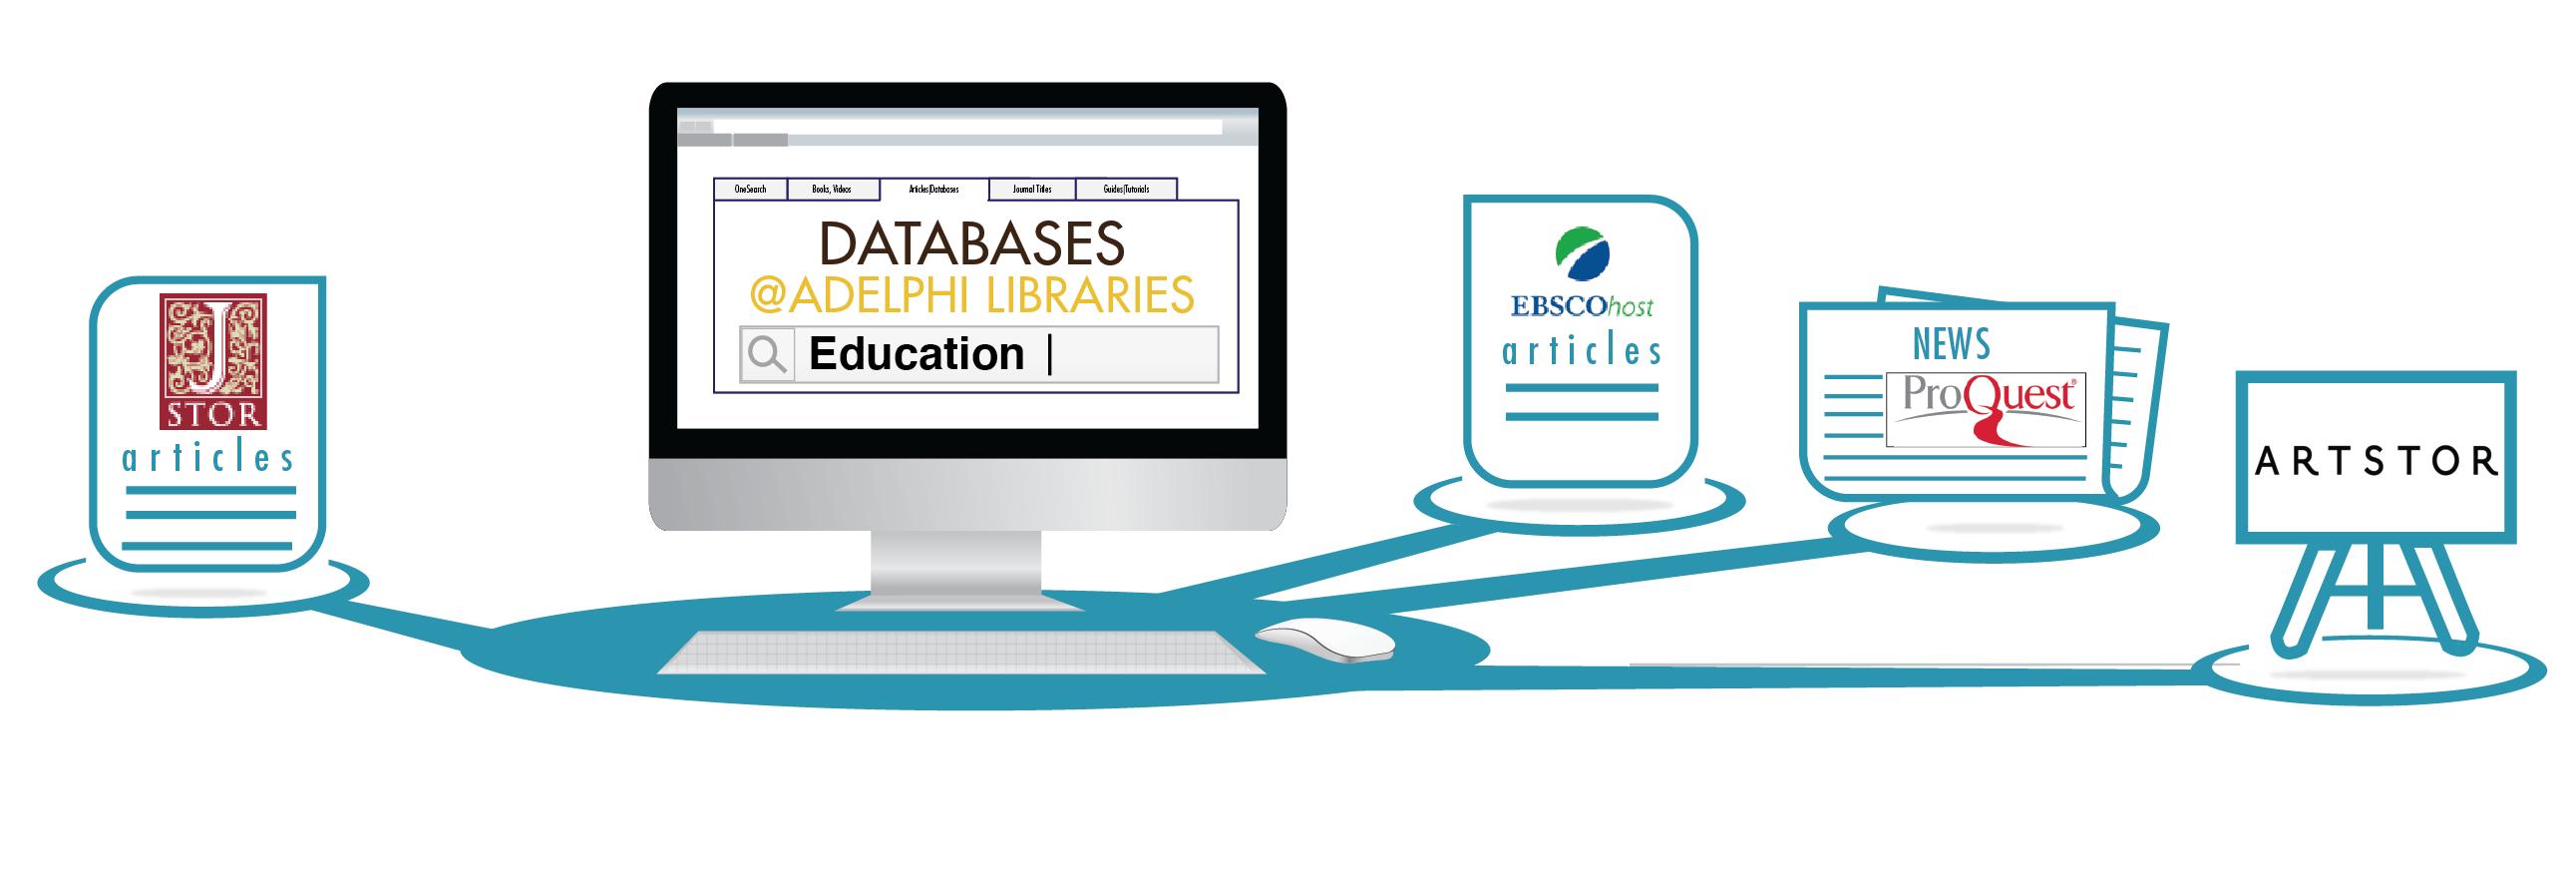 Education-Databases